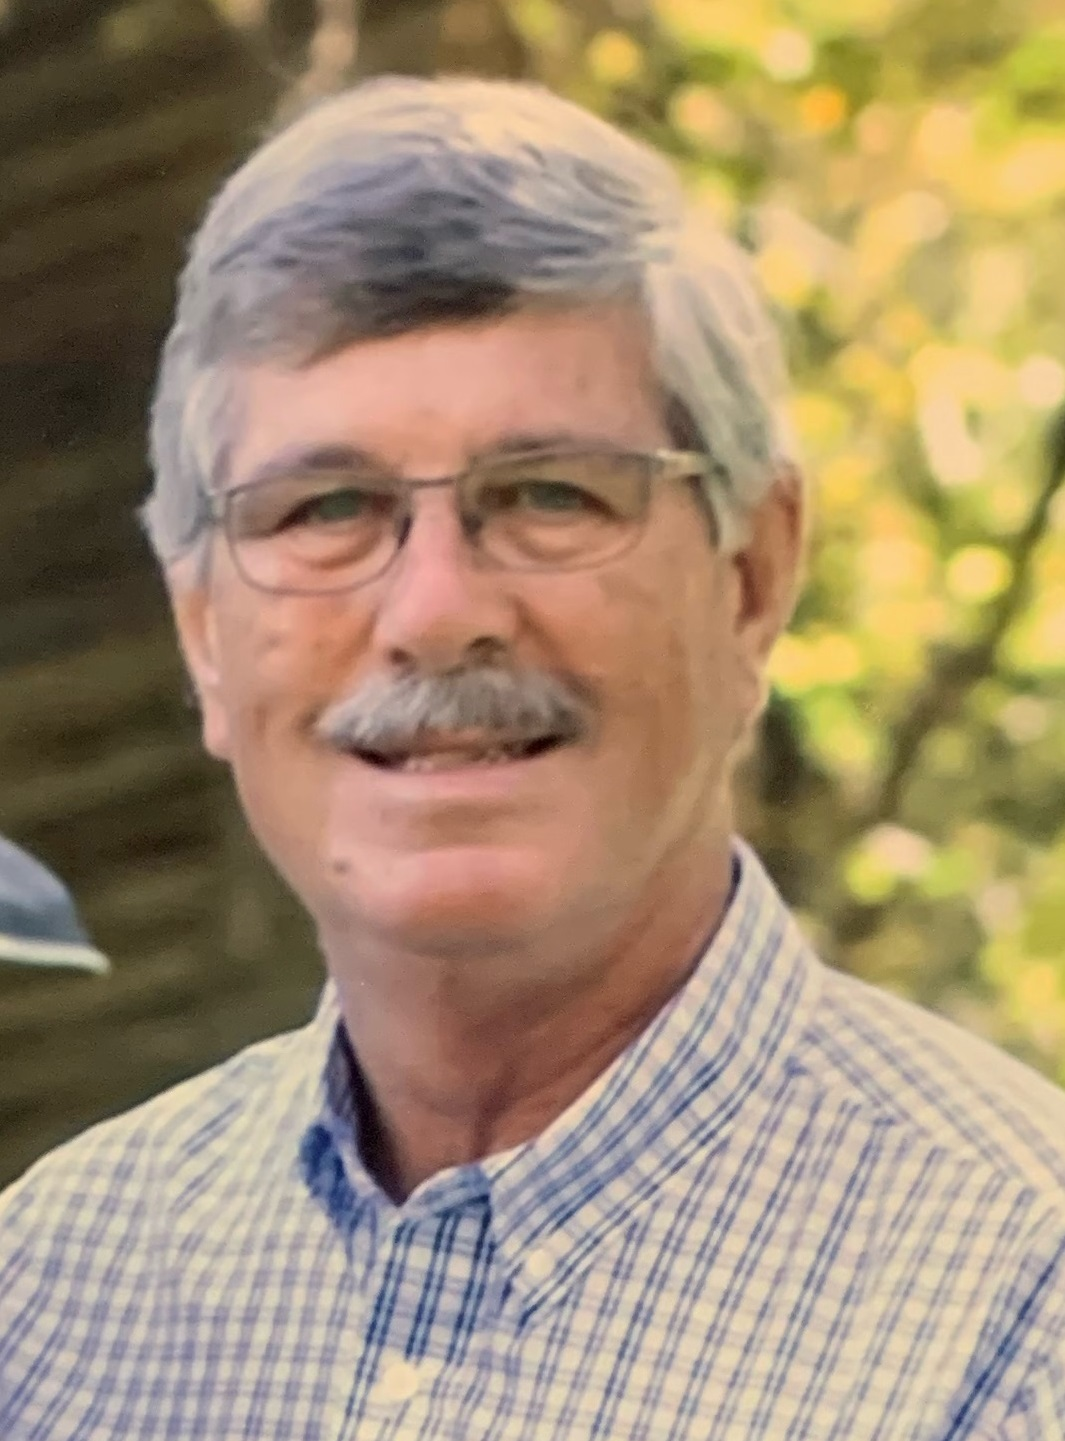 David G. Otte, age 72, of Linwood, Nebraska